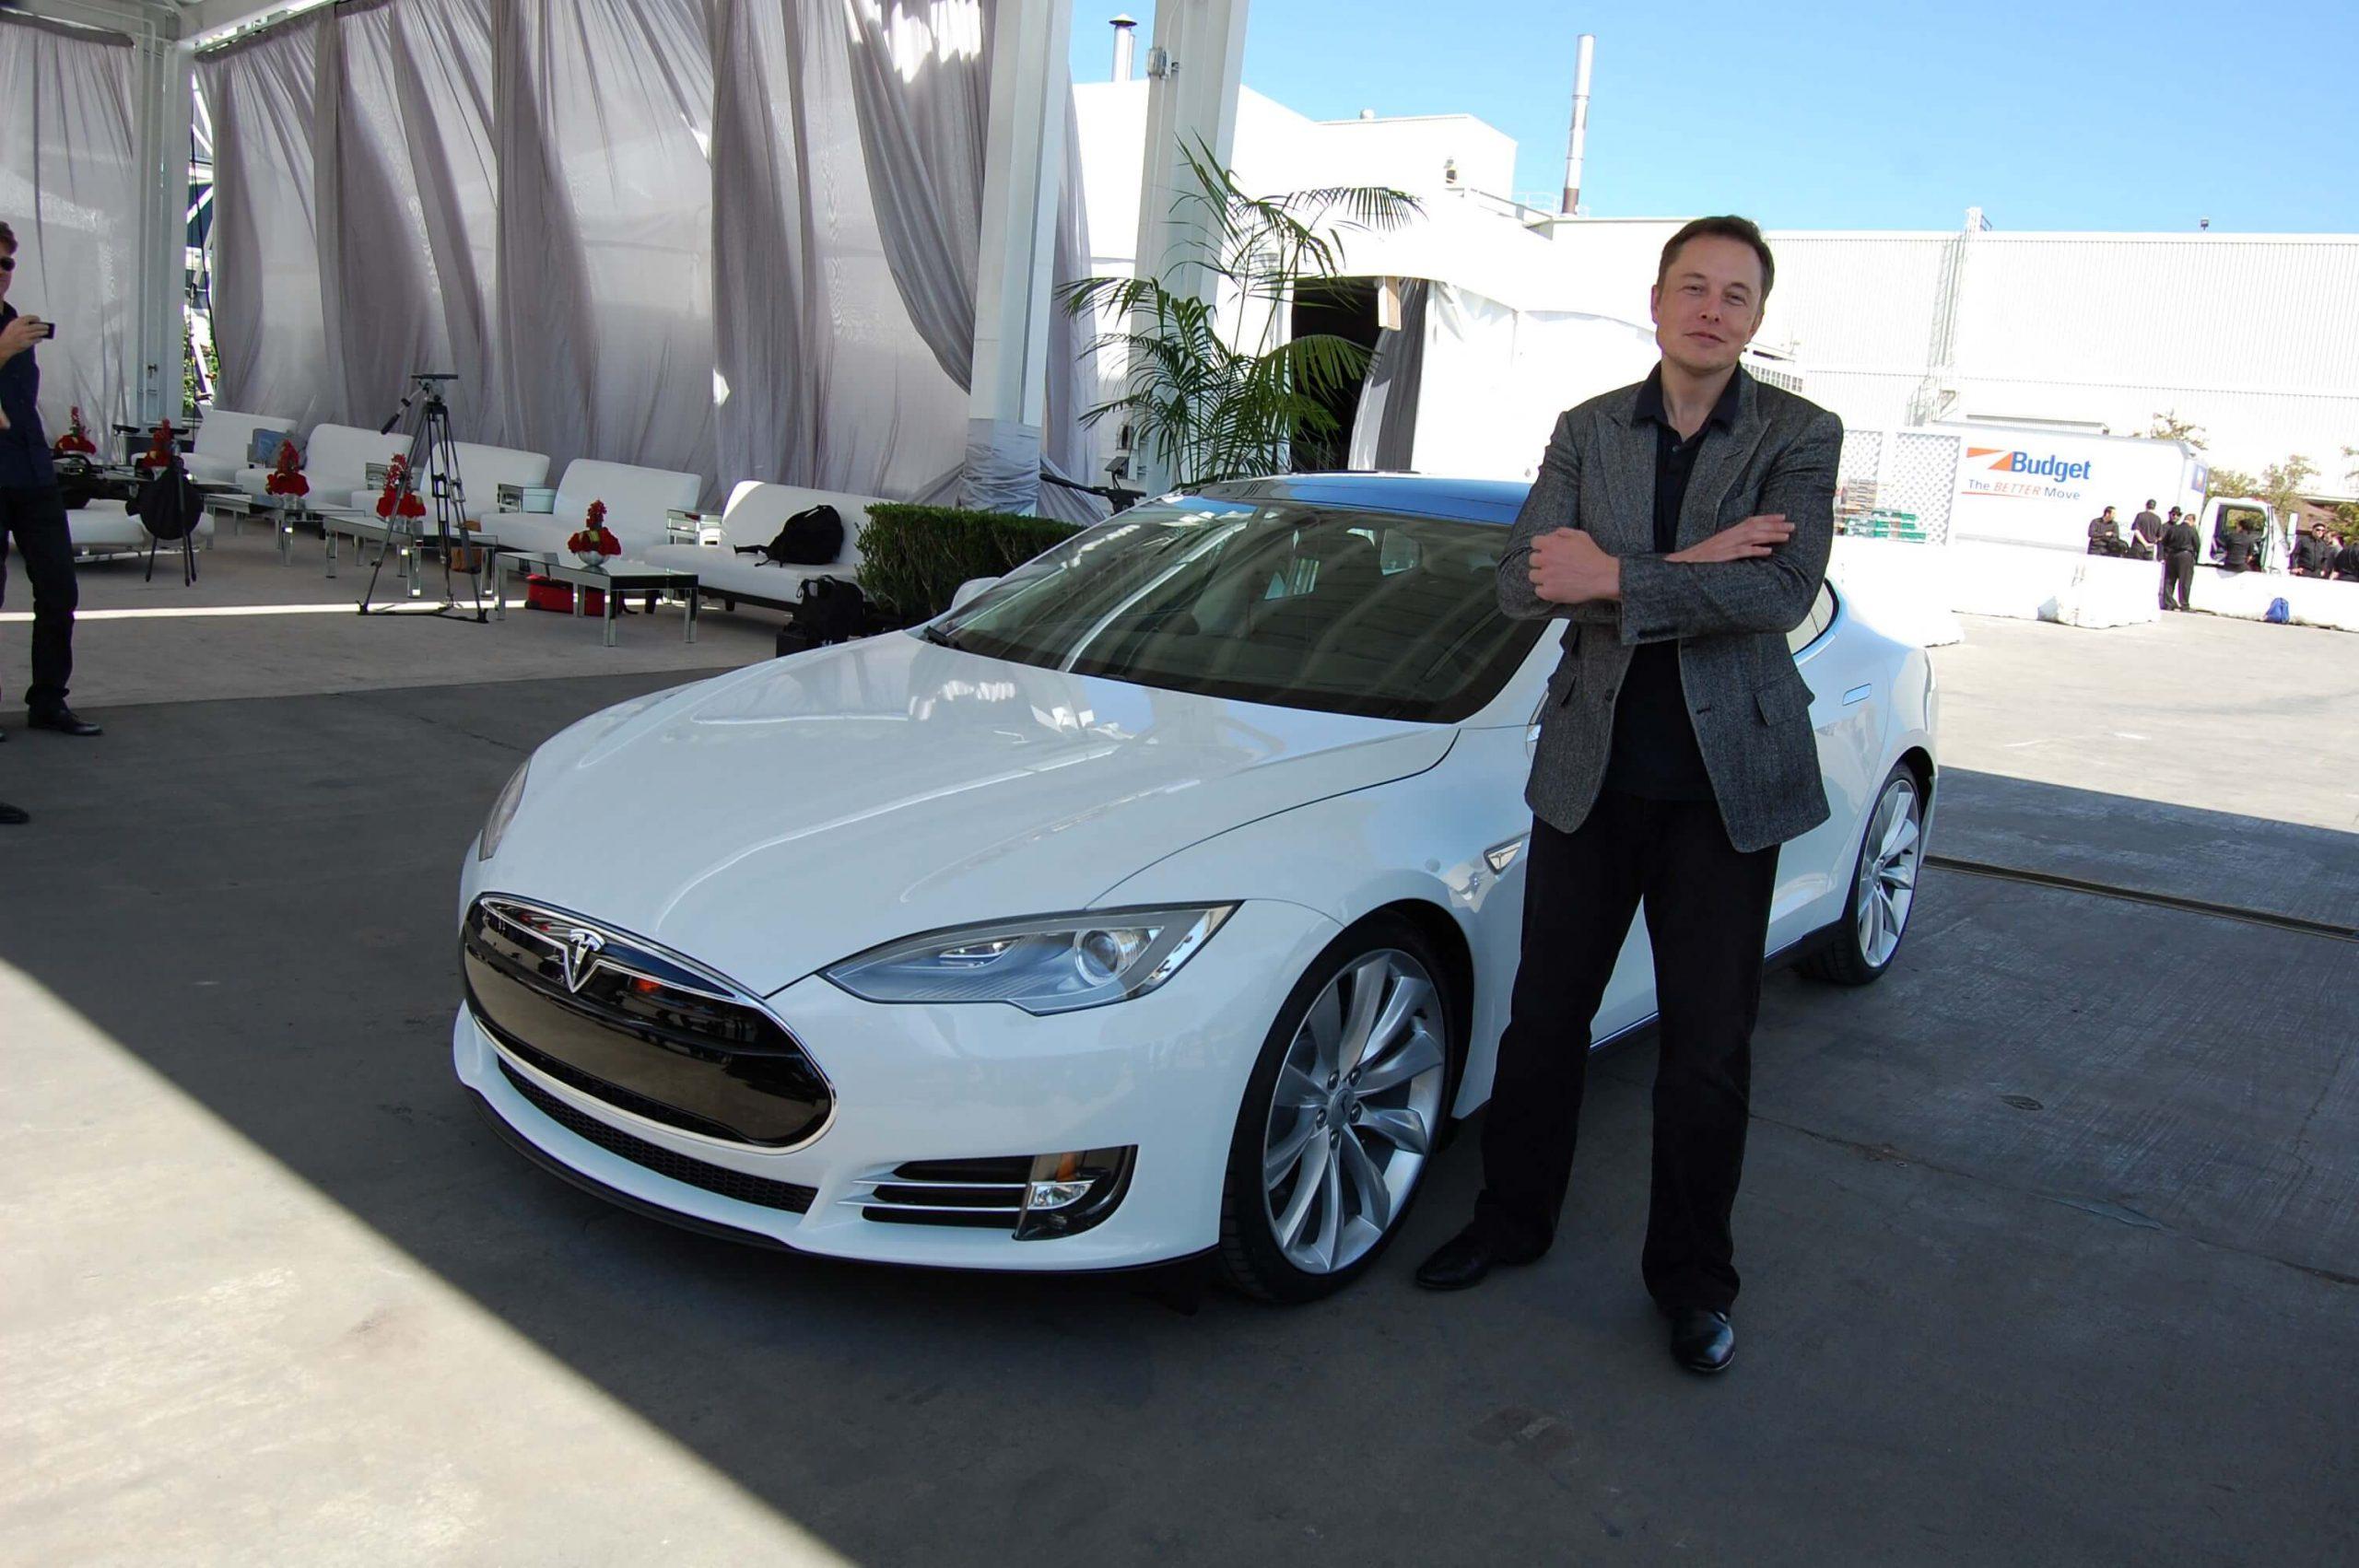 Elon Musk Tesla Factory Fremont CA USA 8765031426 2